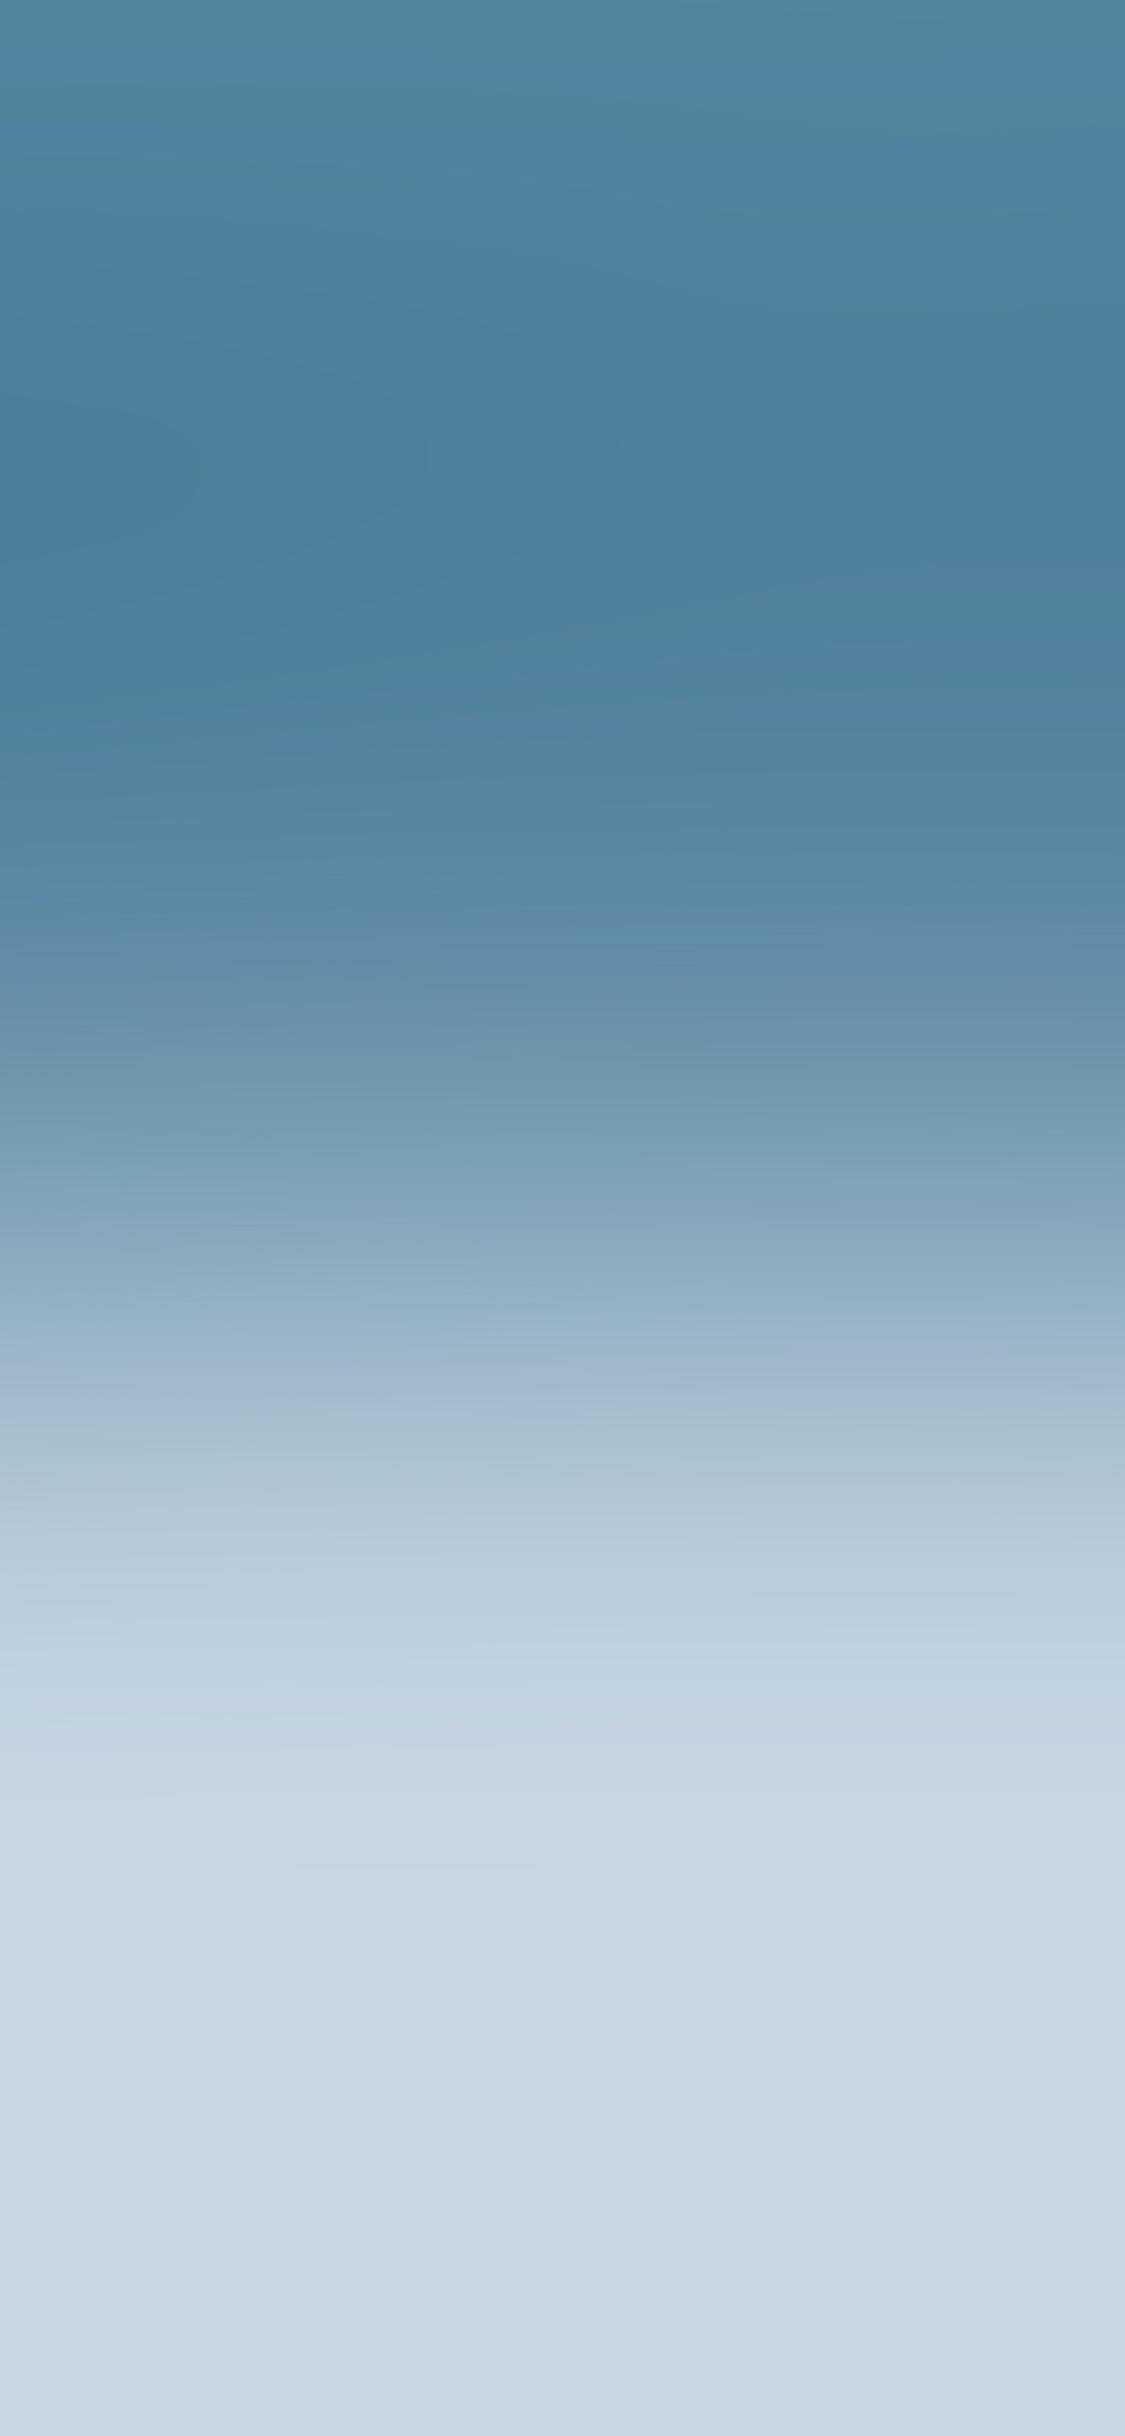 iPhoneXpapers.com-Apple-iPhone-wallpaper-sf85-sky-diving-gradation-blur